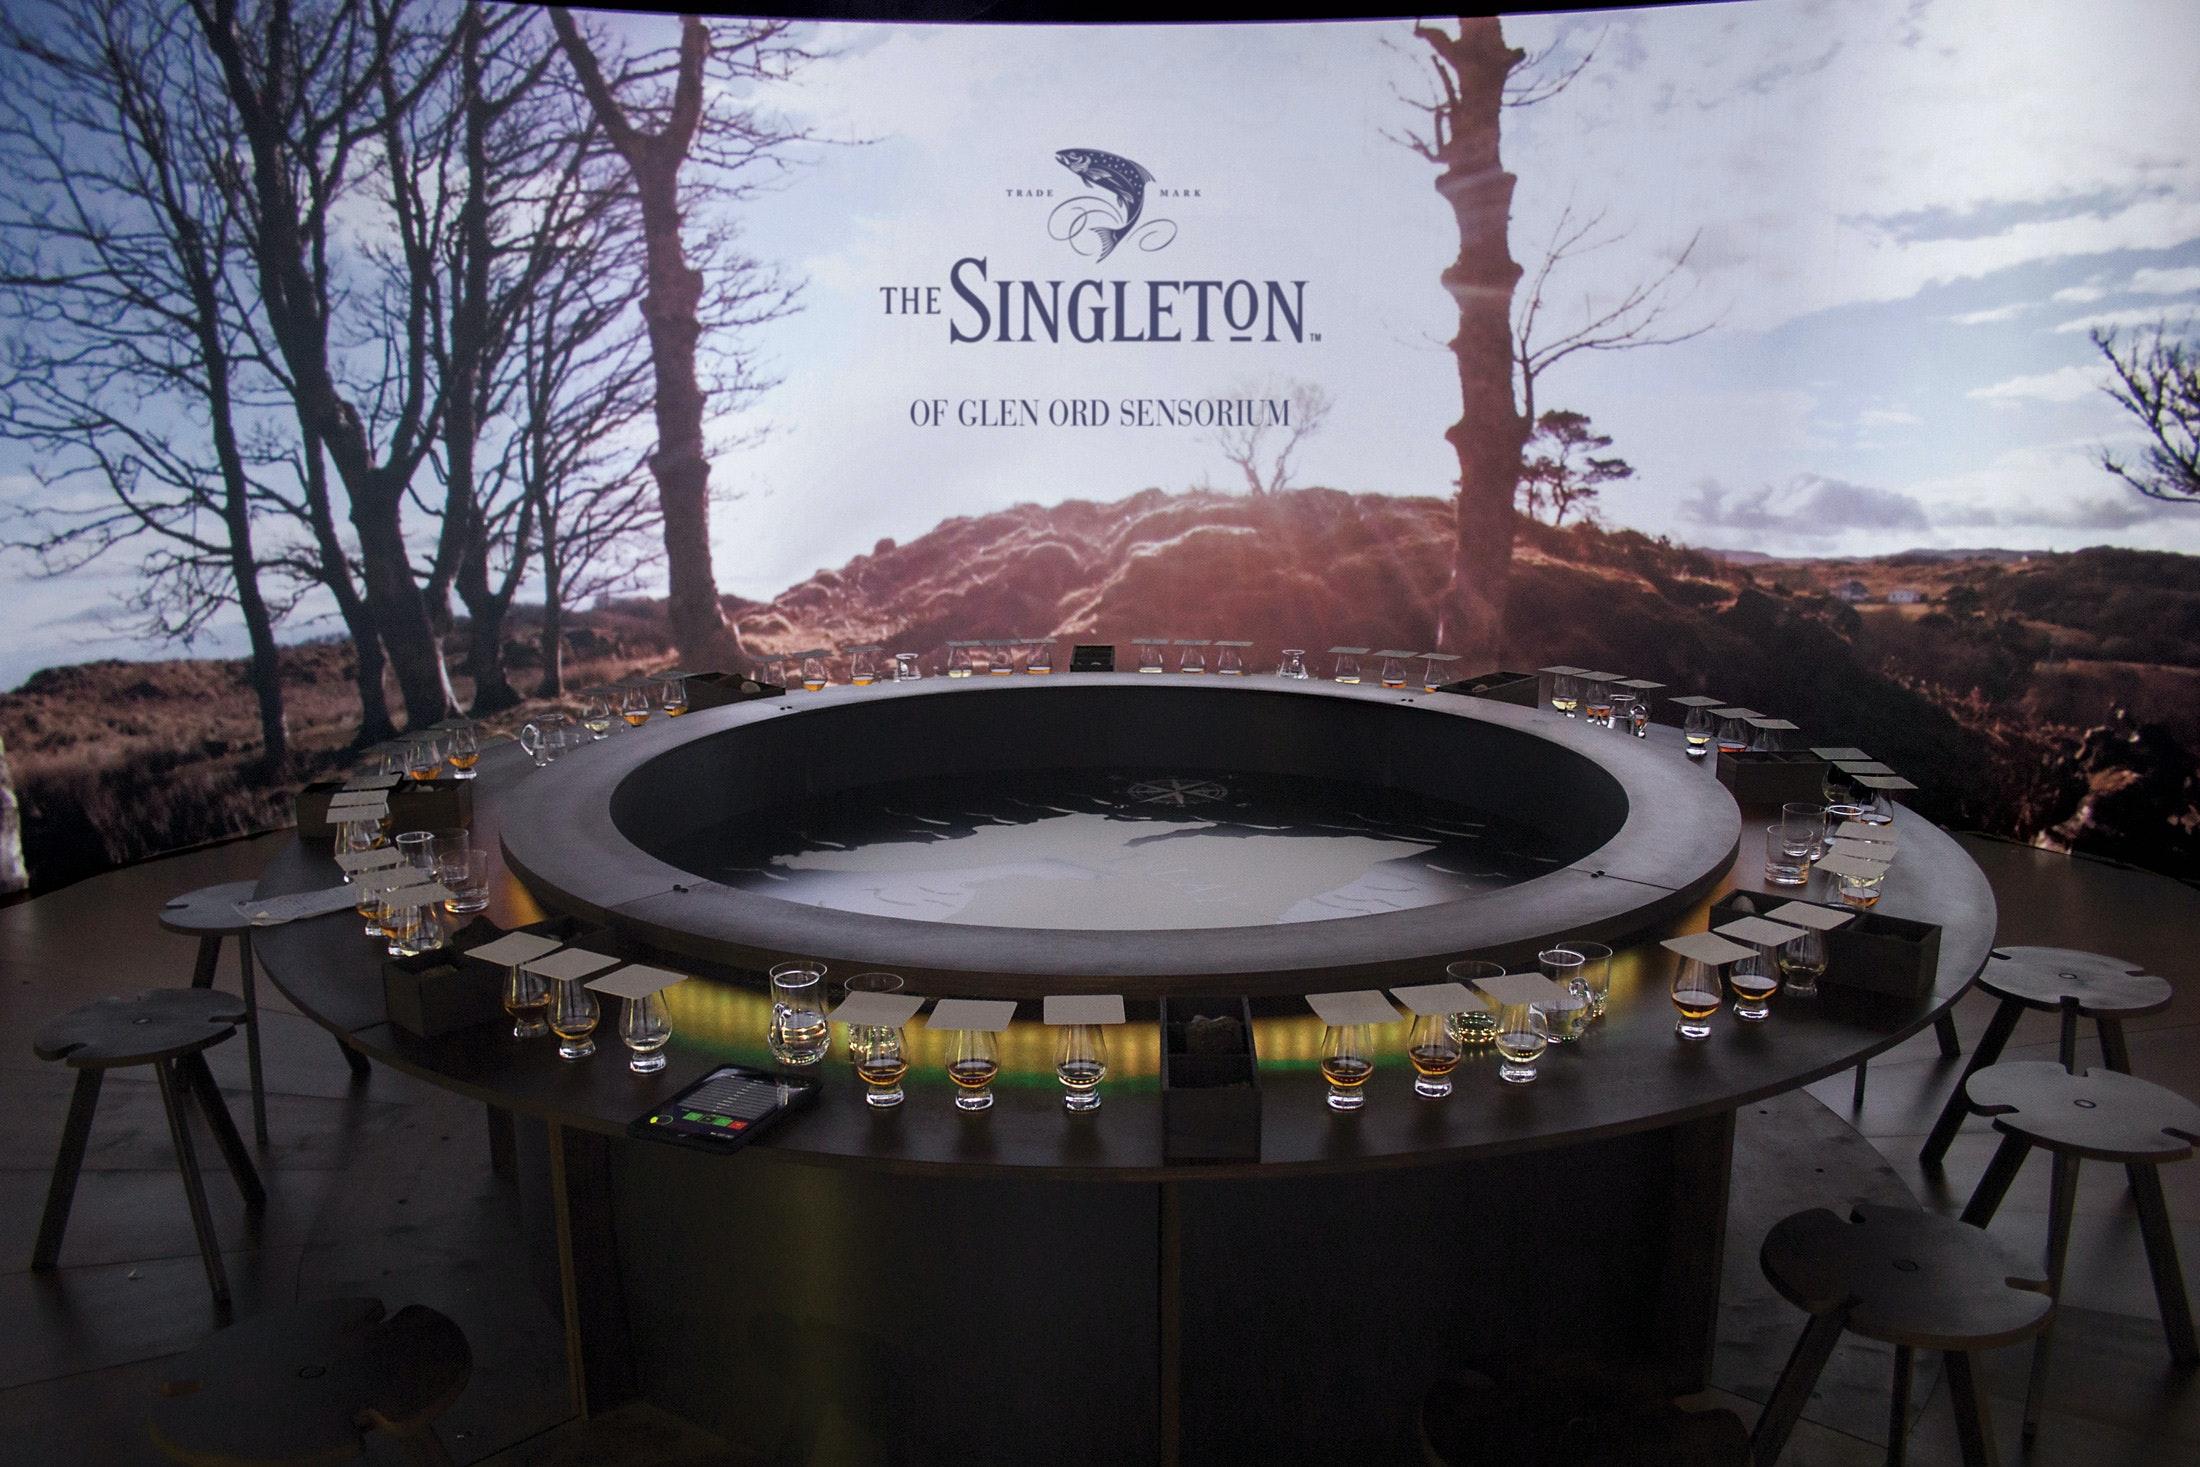 The Singleton of Glen Ord Sensorium